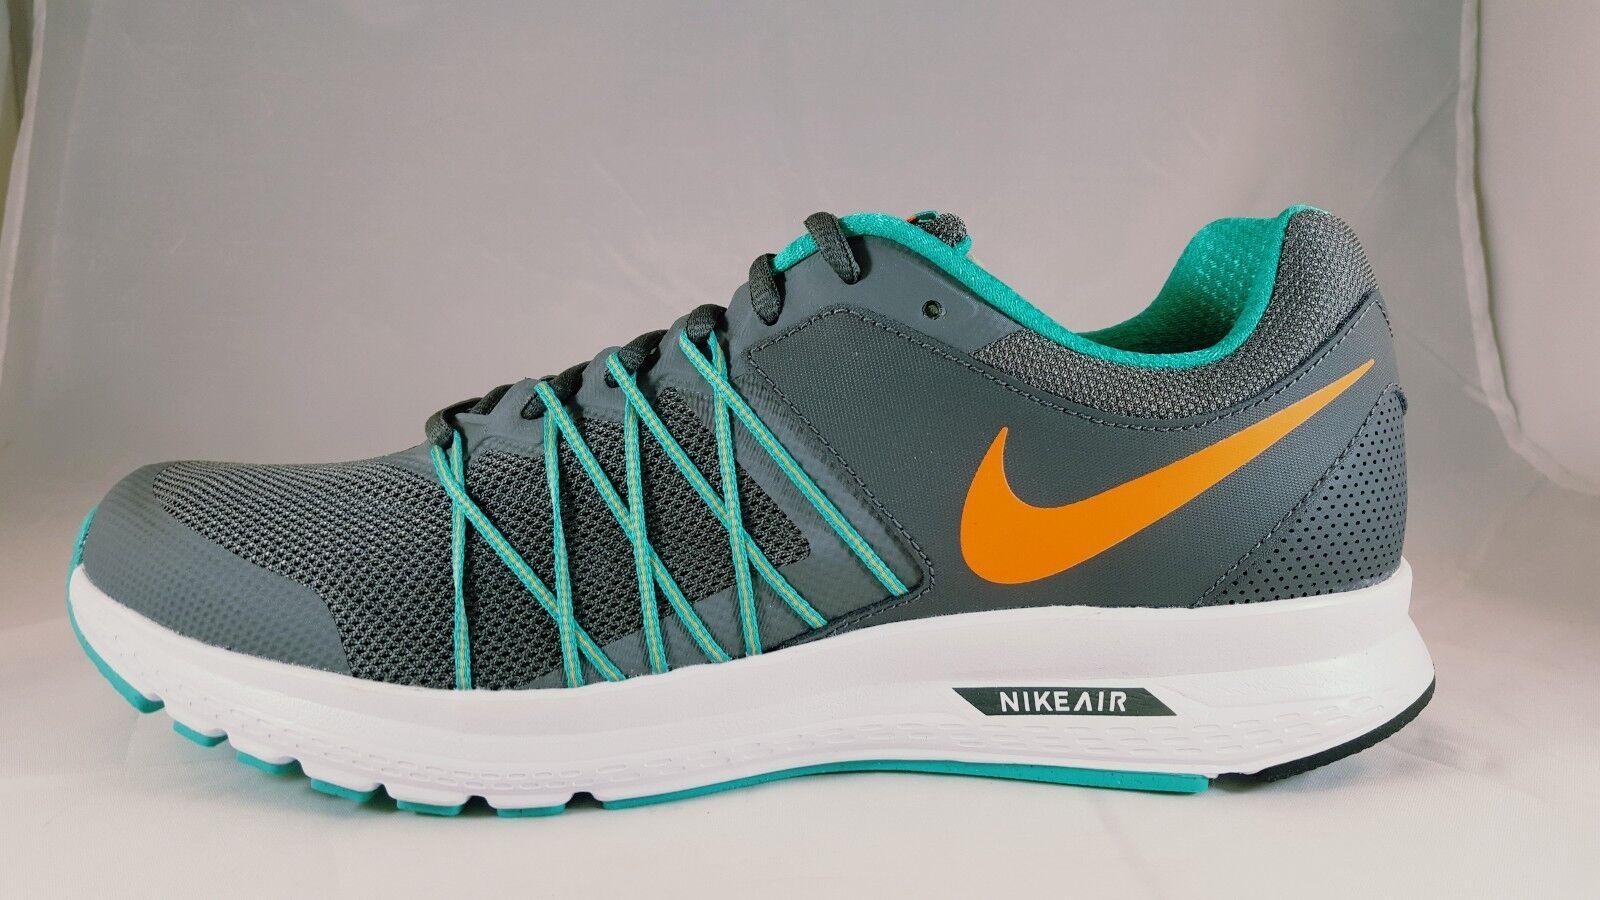 Nike Athletic Air Relentless 6 Men's Athletic Nike Shoe 843836 002 Size 10.5 df1928